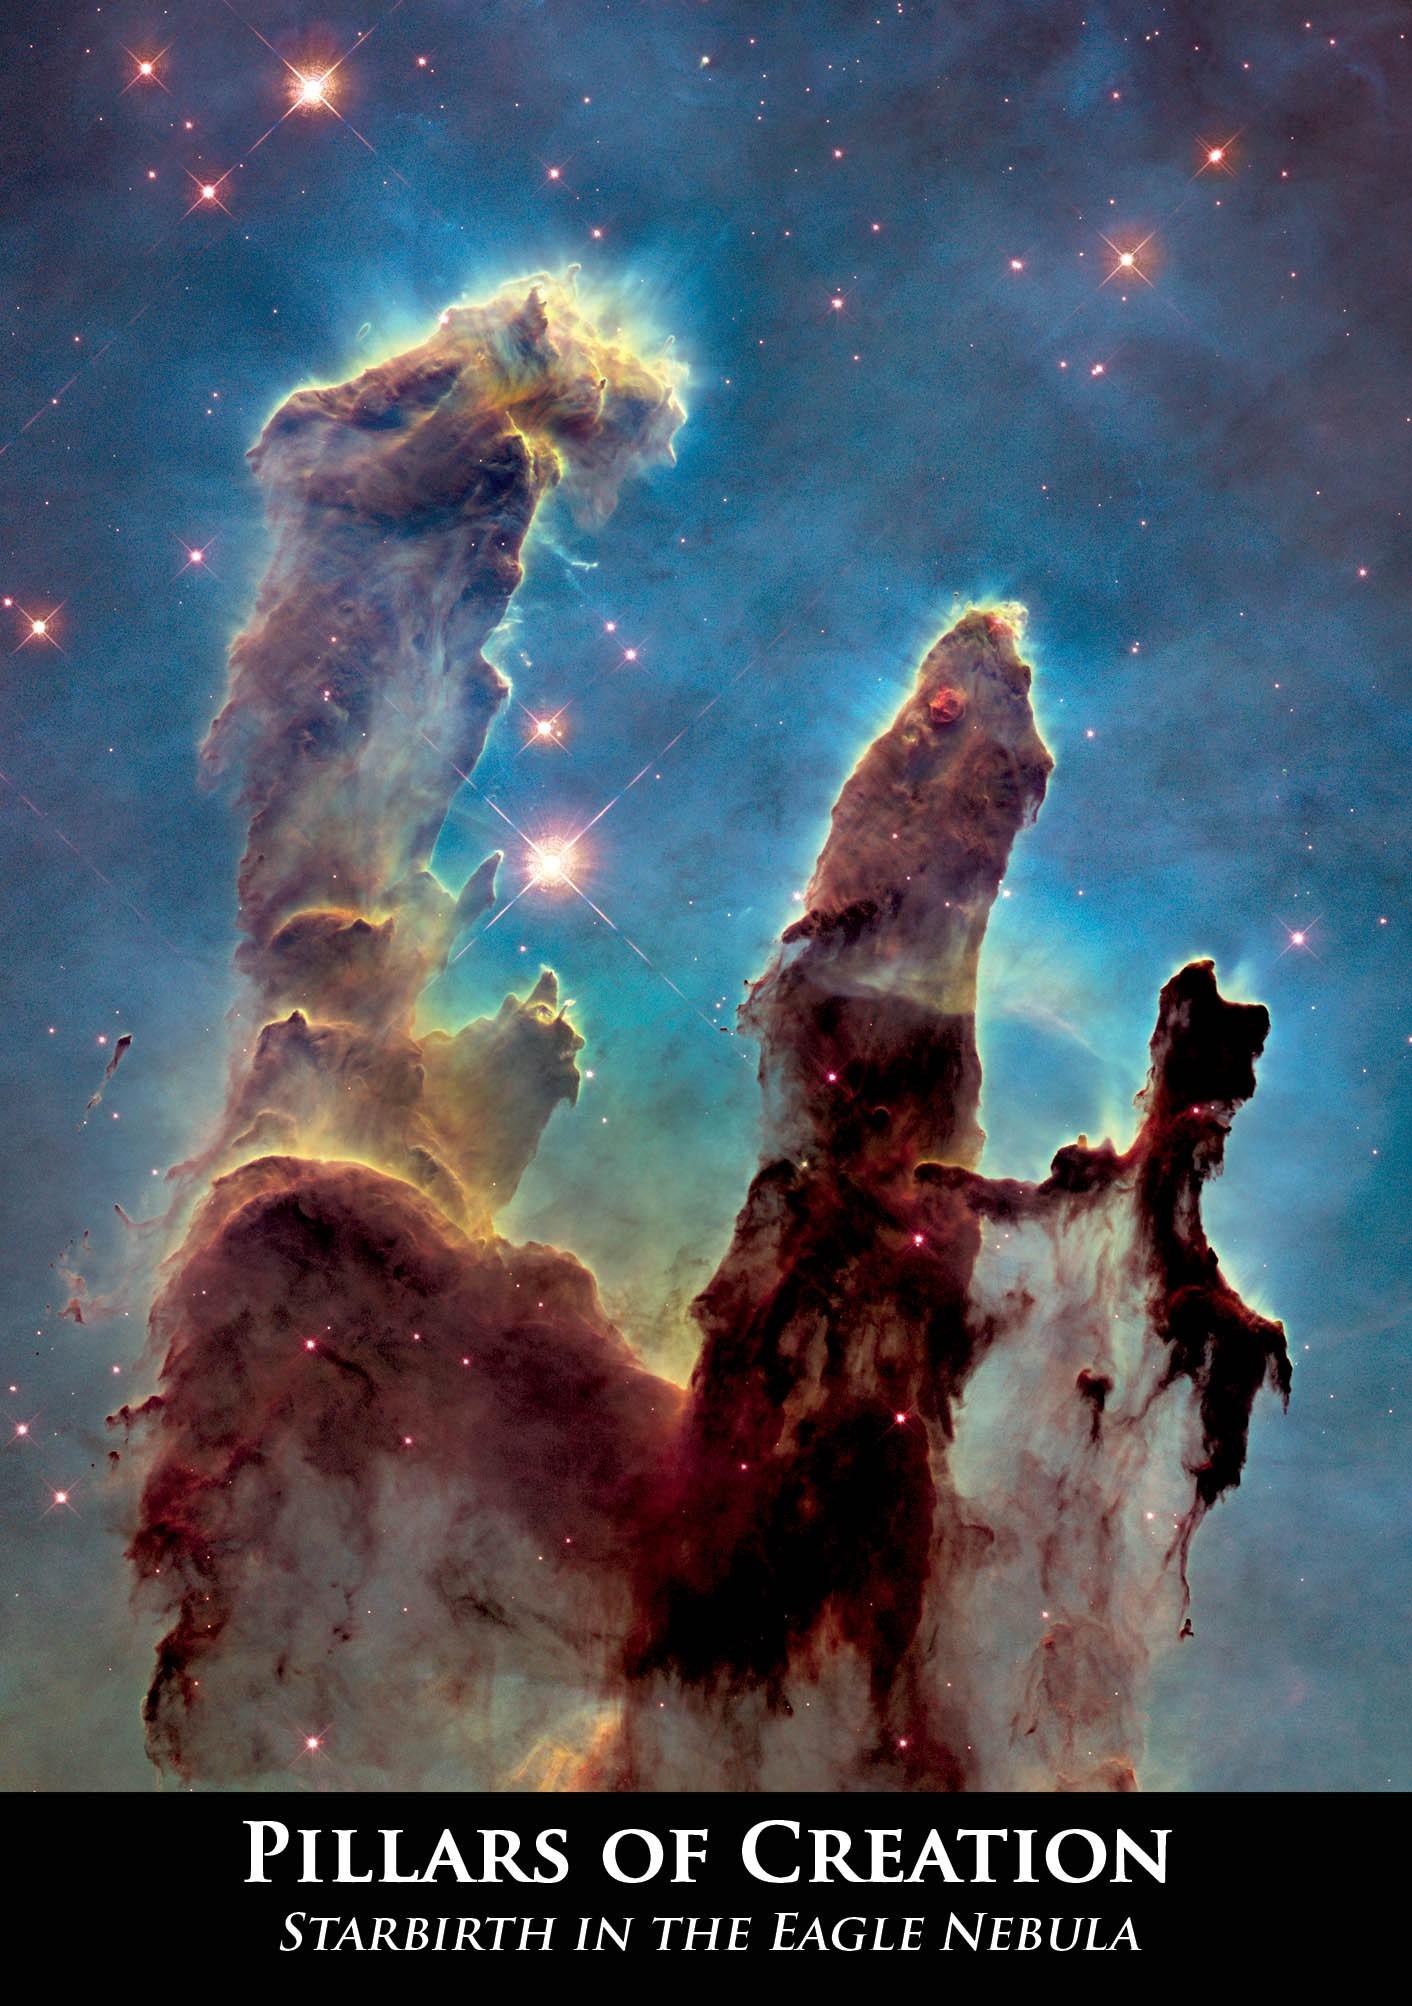 Astrovisuals Postcard - Pillars of Creation